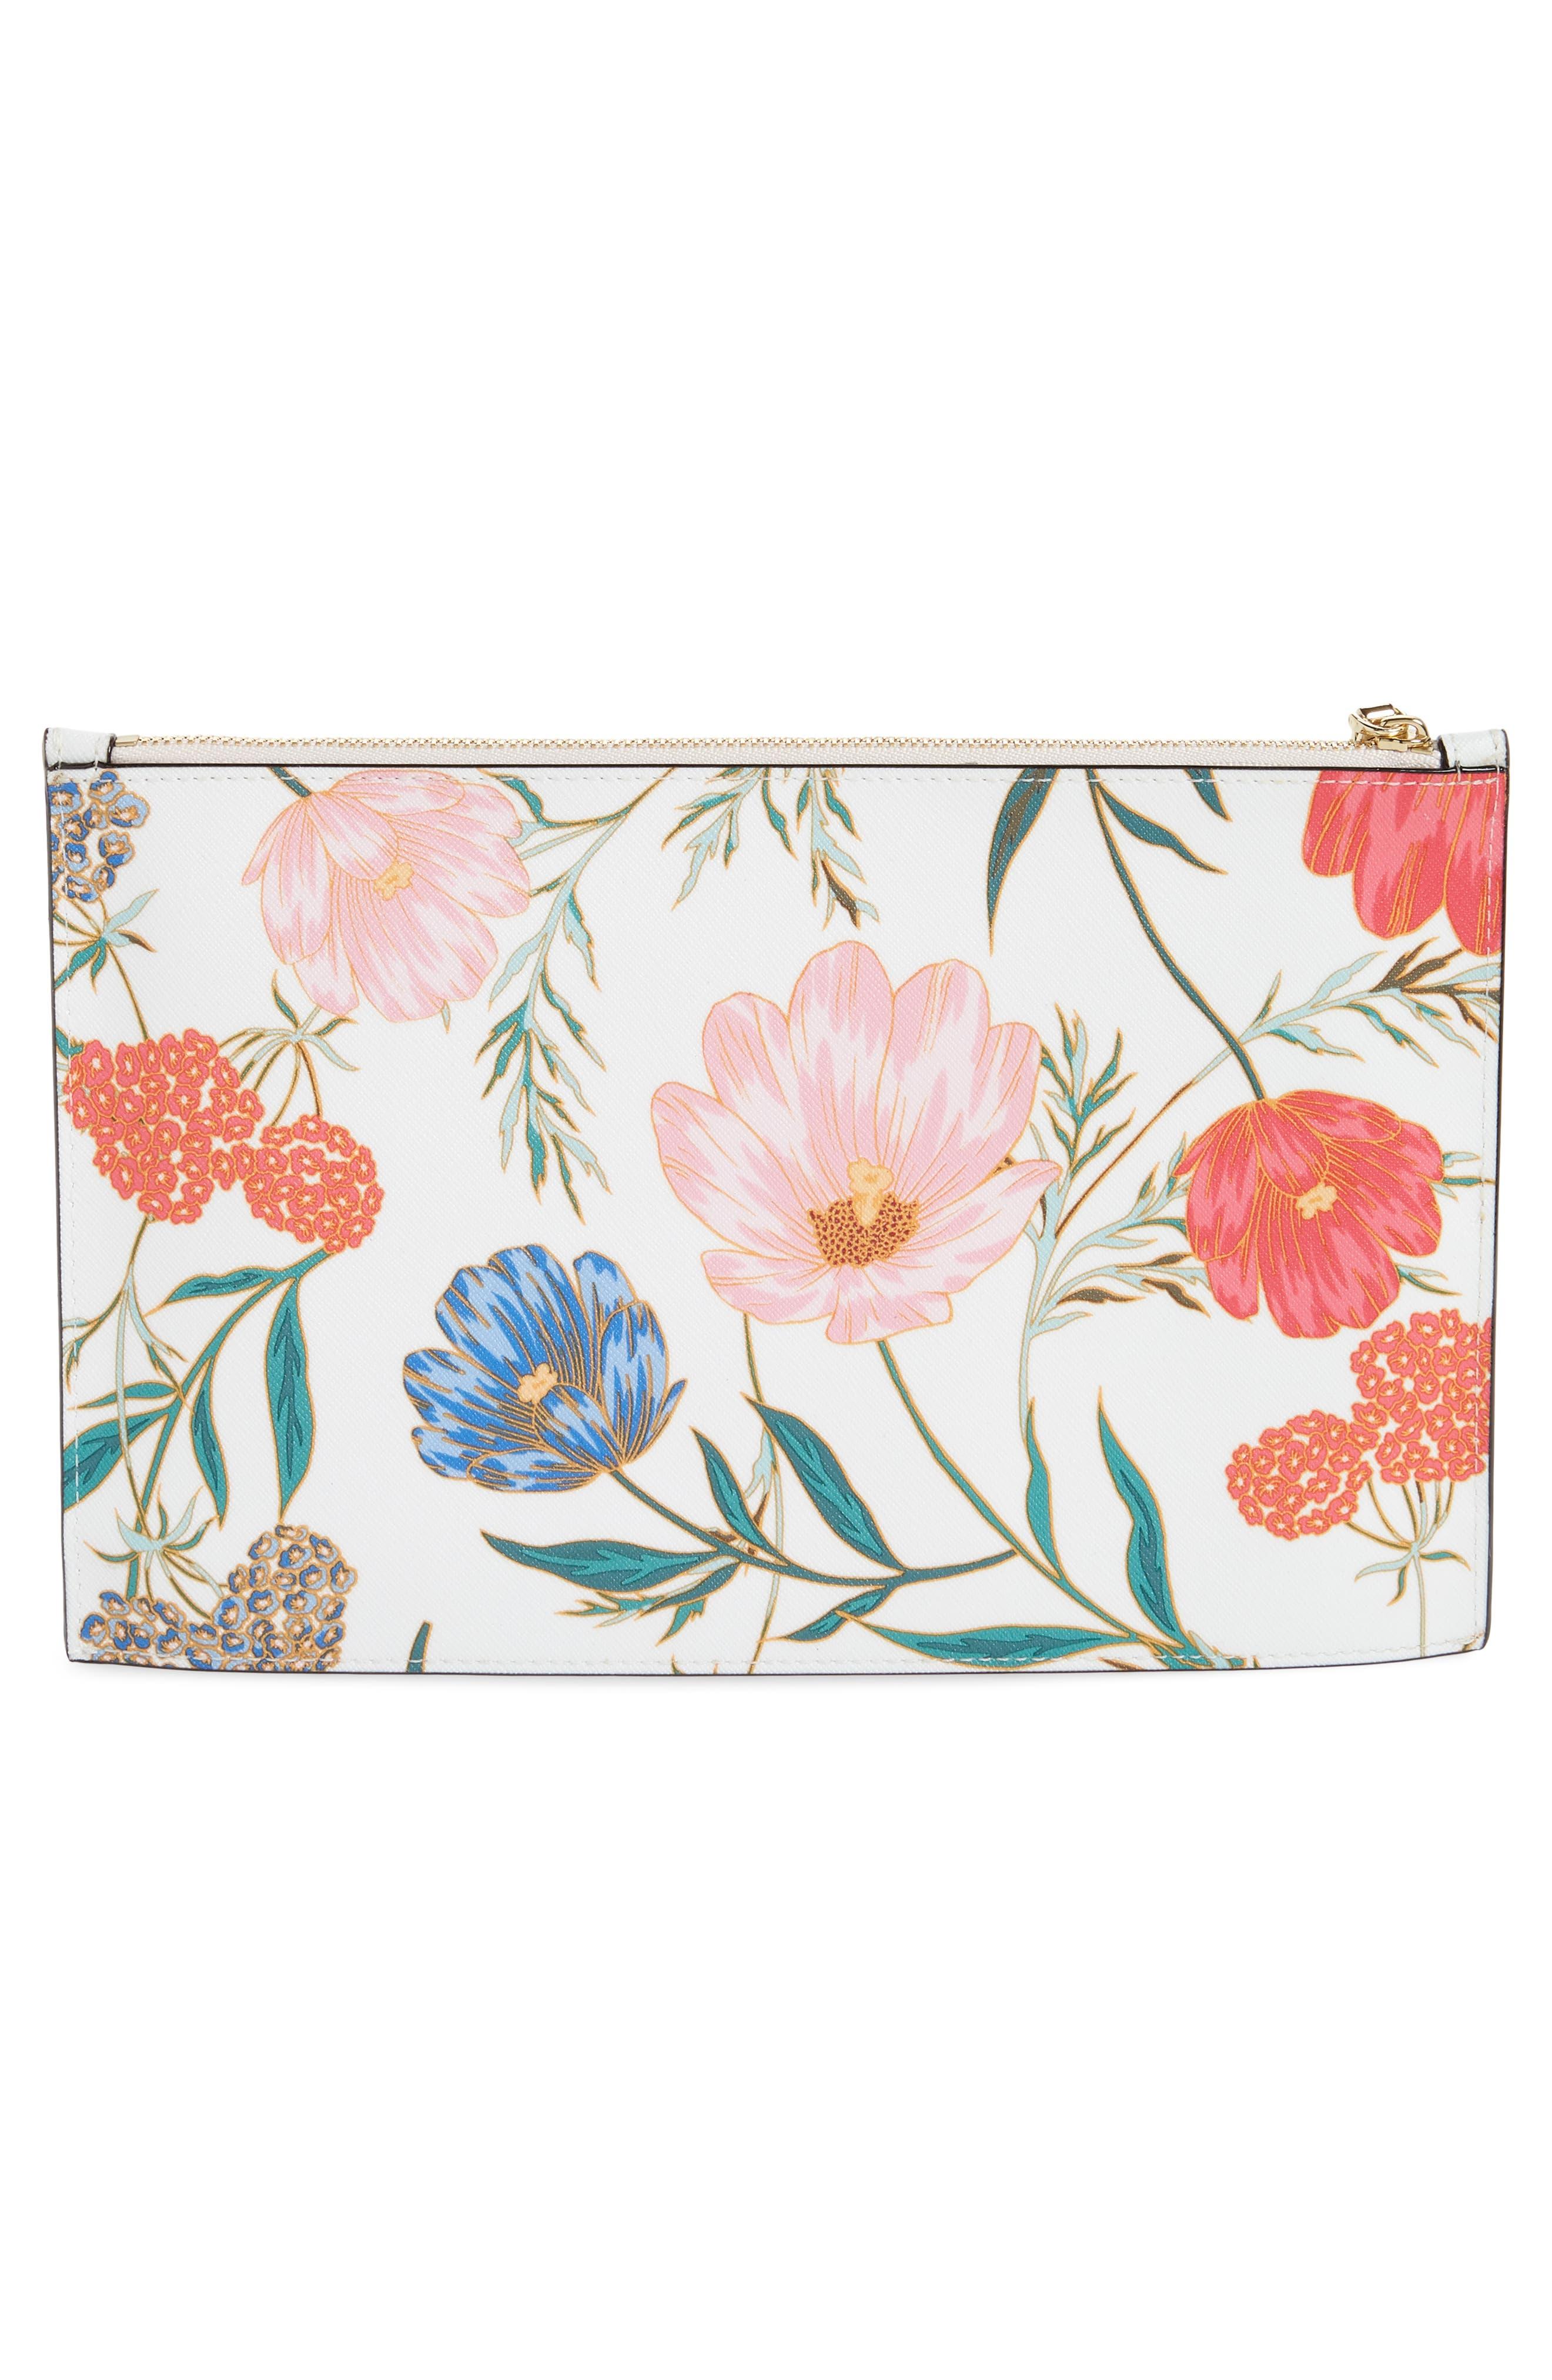 cameron street – blossom lilia leather clutch,                             Alternate thumbnail 3, color,                             Cream